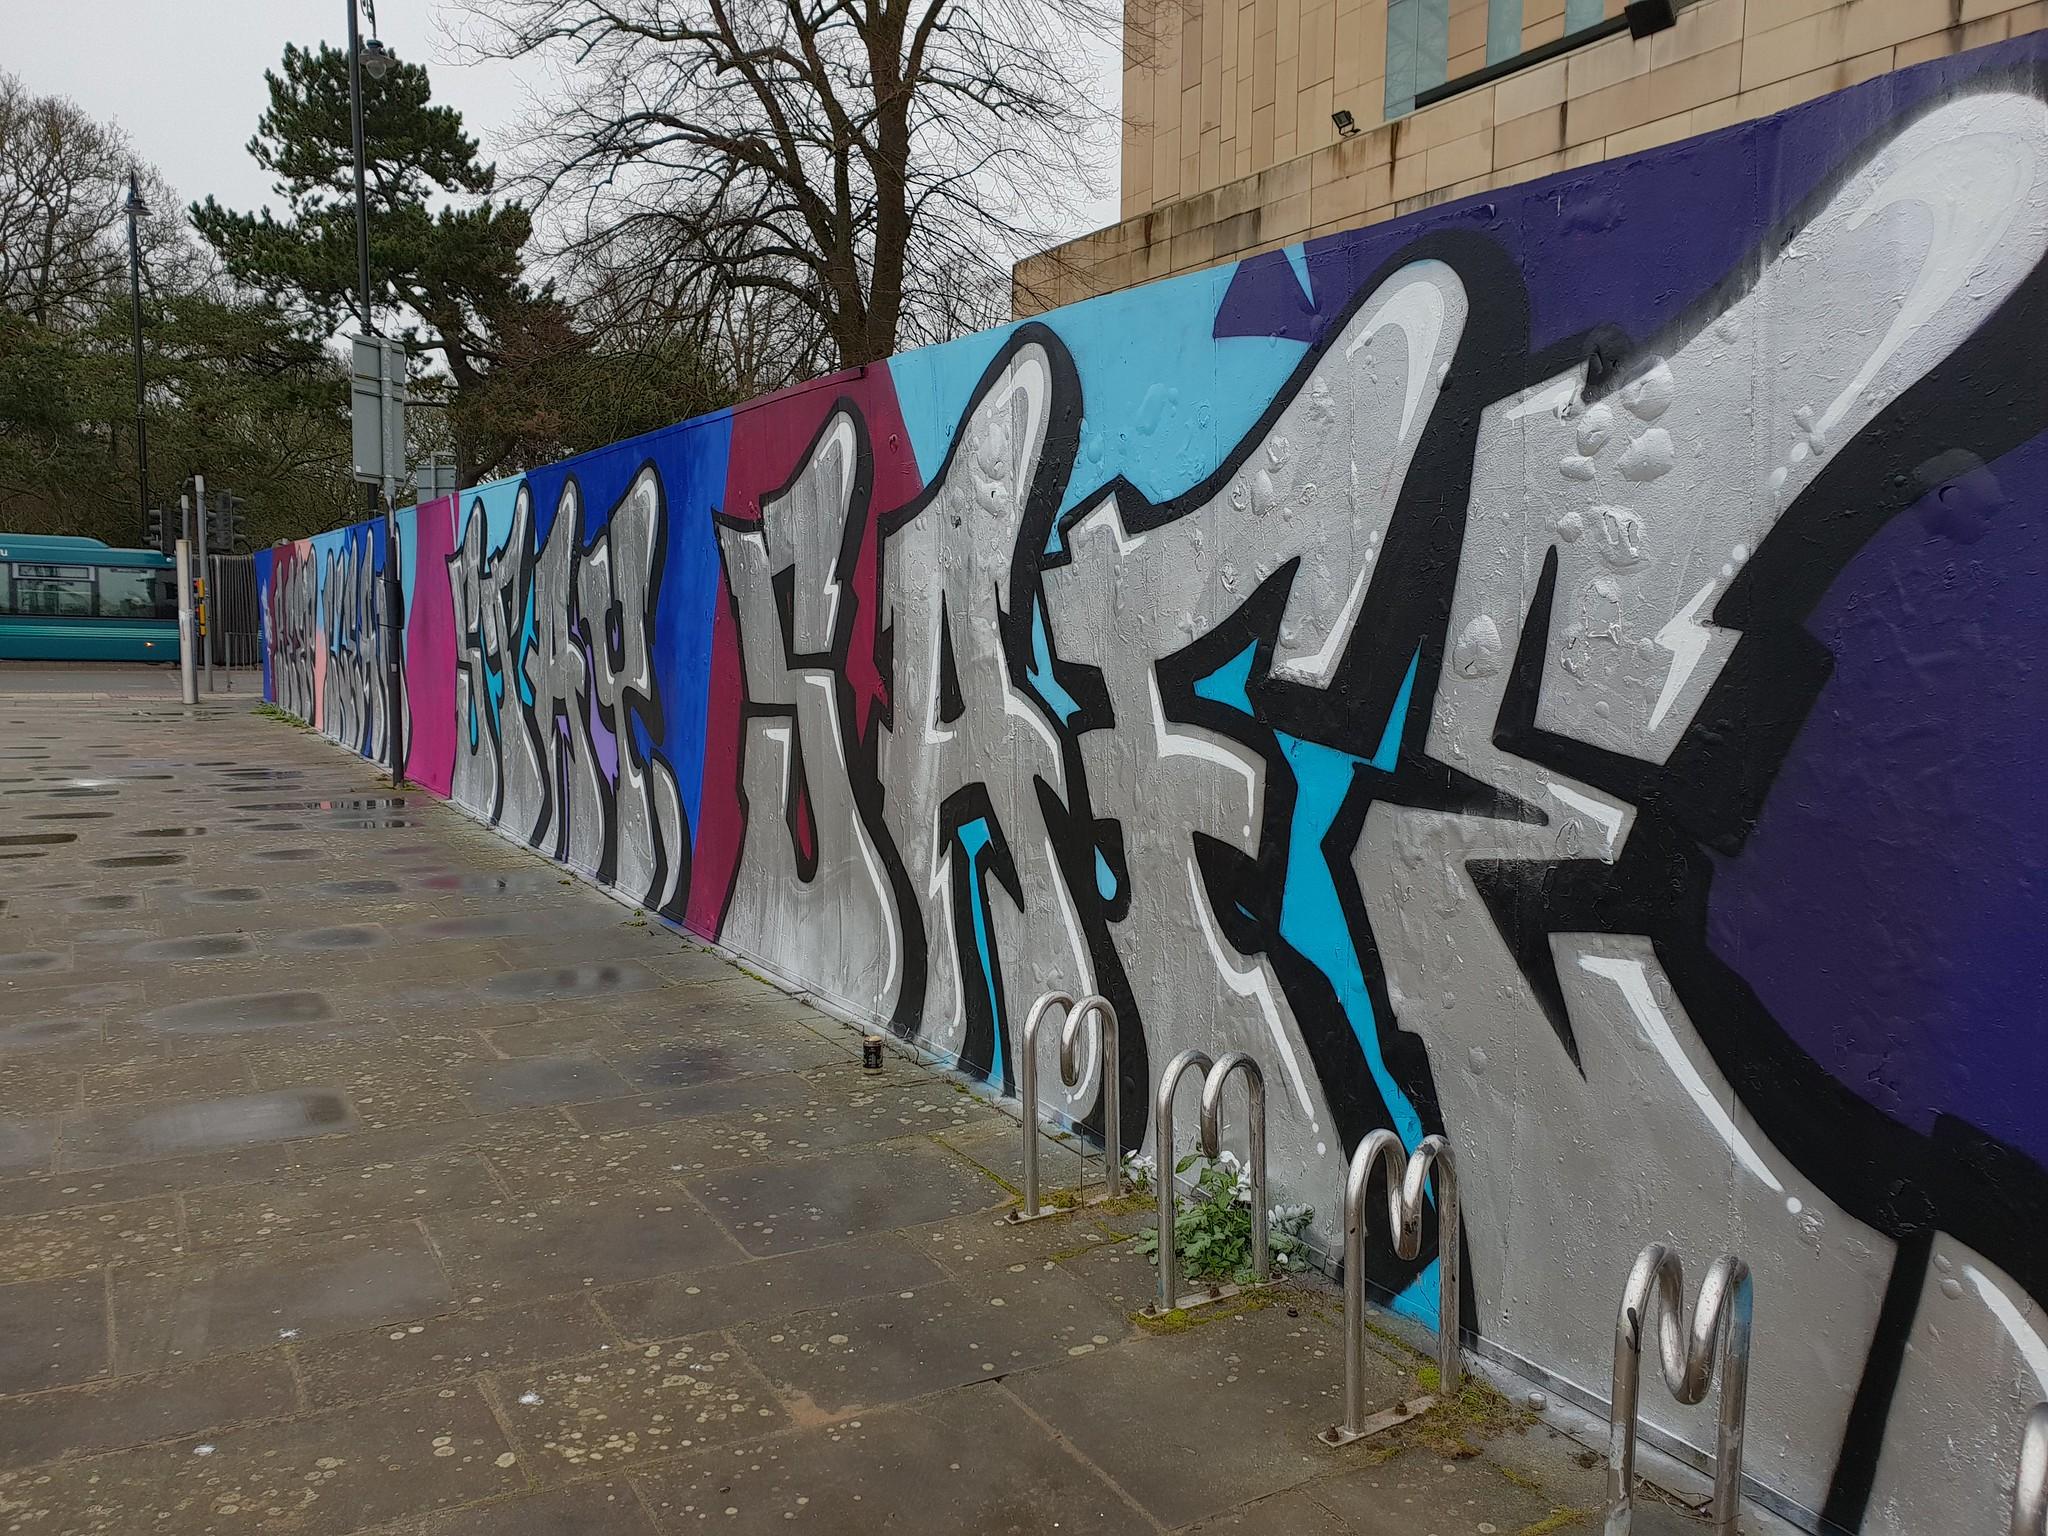 Millennium Walkway street art, Cardiff